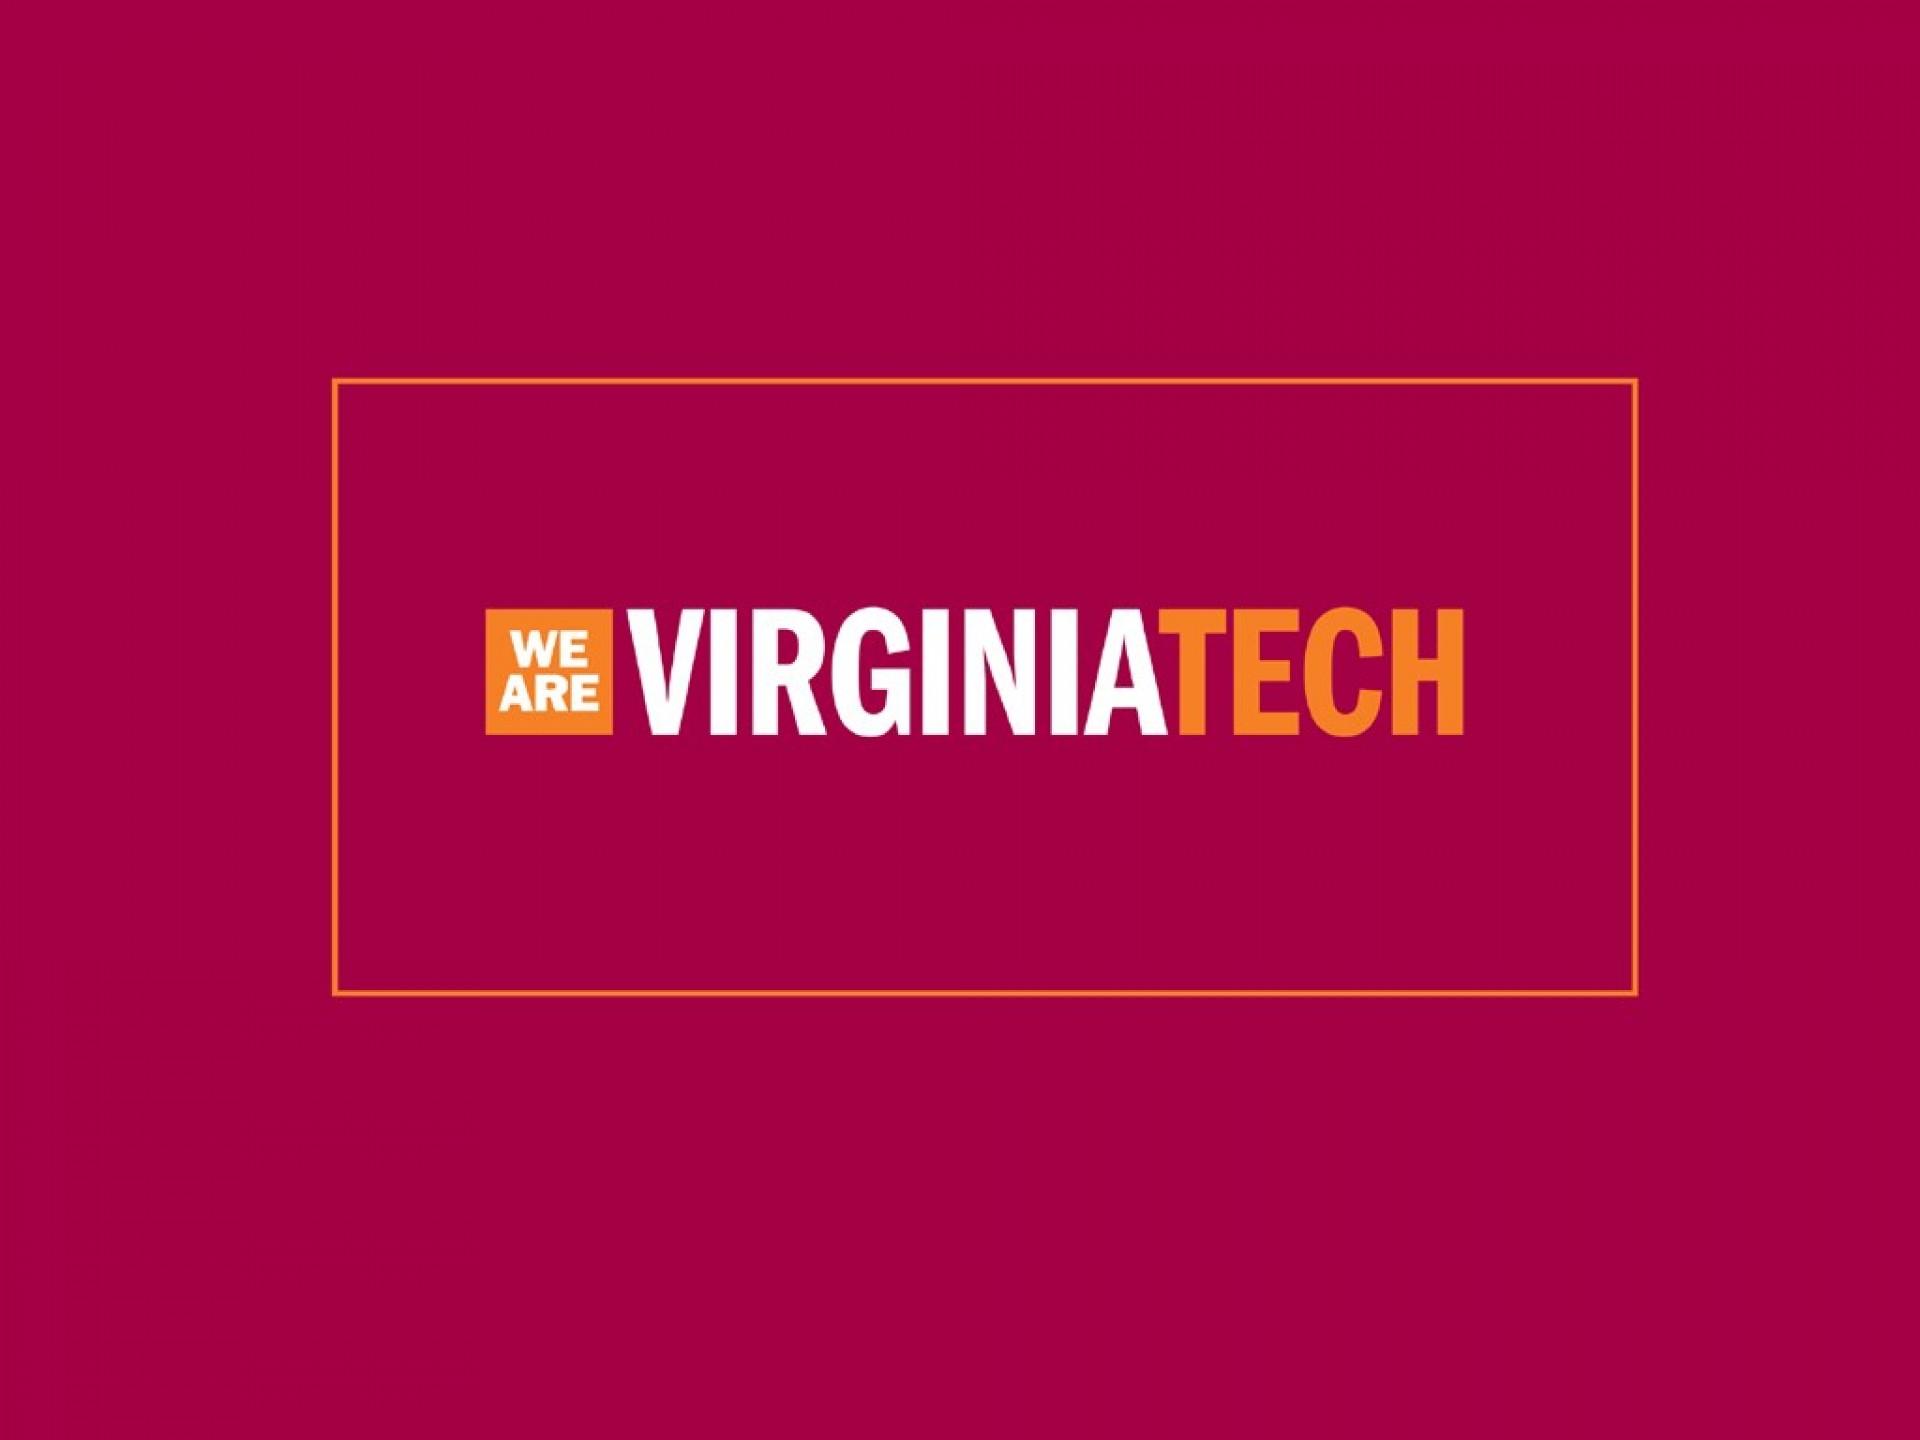 026 Essay Example Vatechposter1024x768 Virginia Tech Phenomenal Essays Reddit Prompts 2018 Sat Requirements 1920